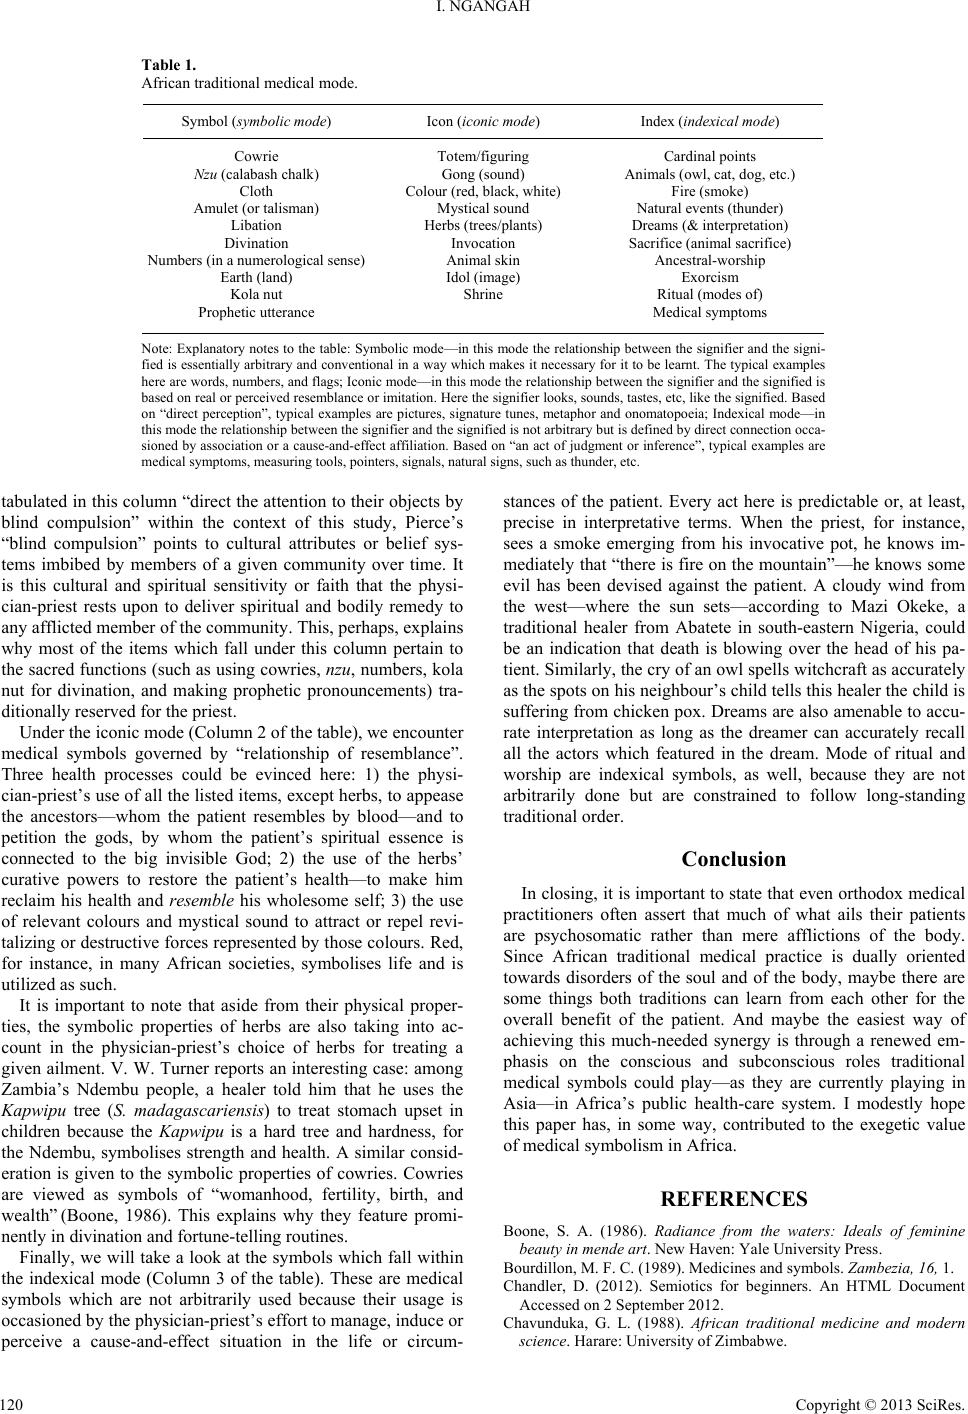 The Epistemology Of Symbols In African Medicine